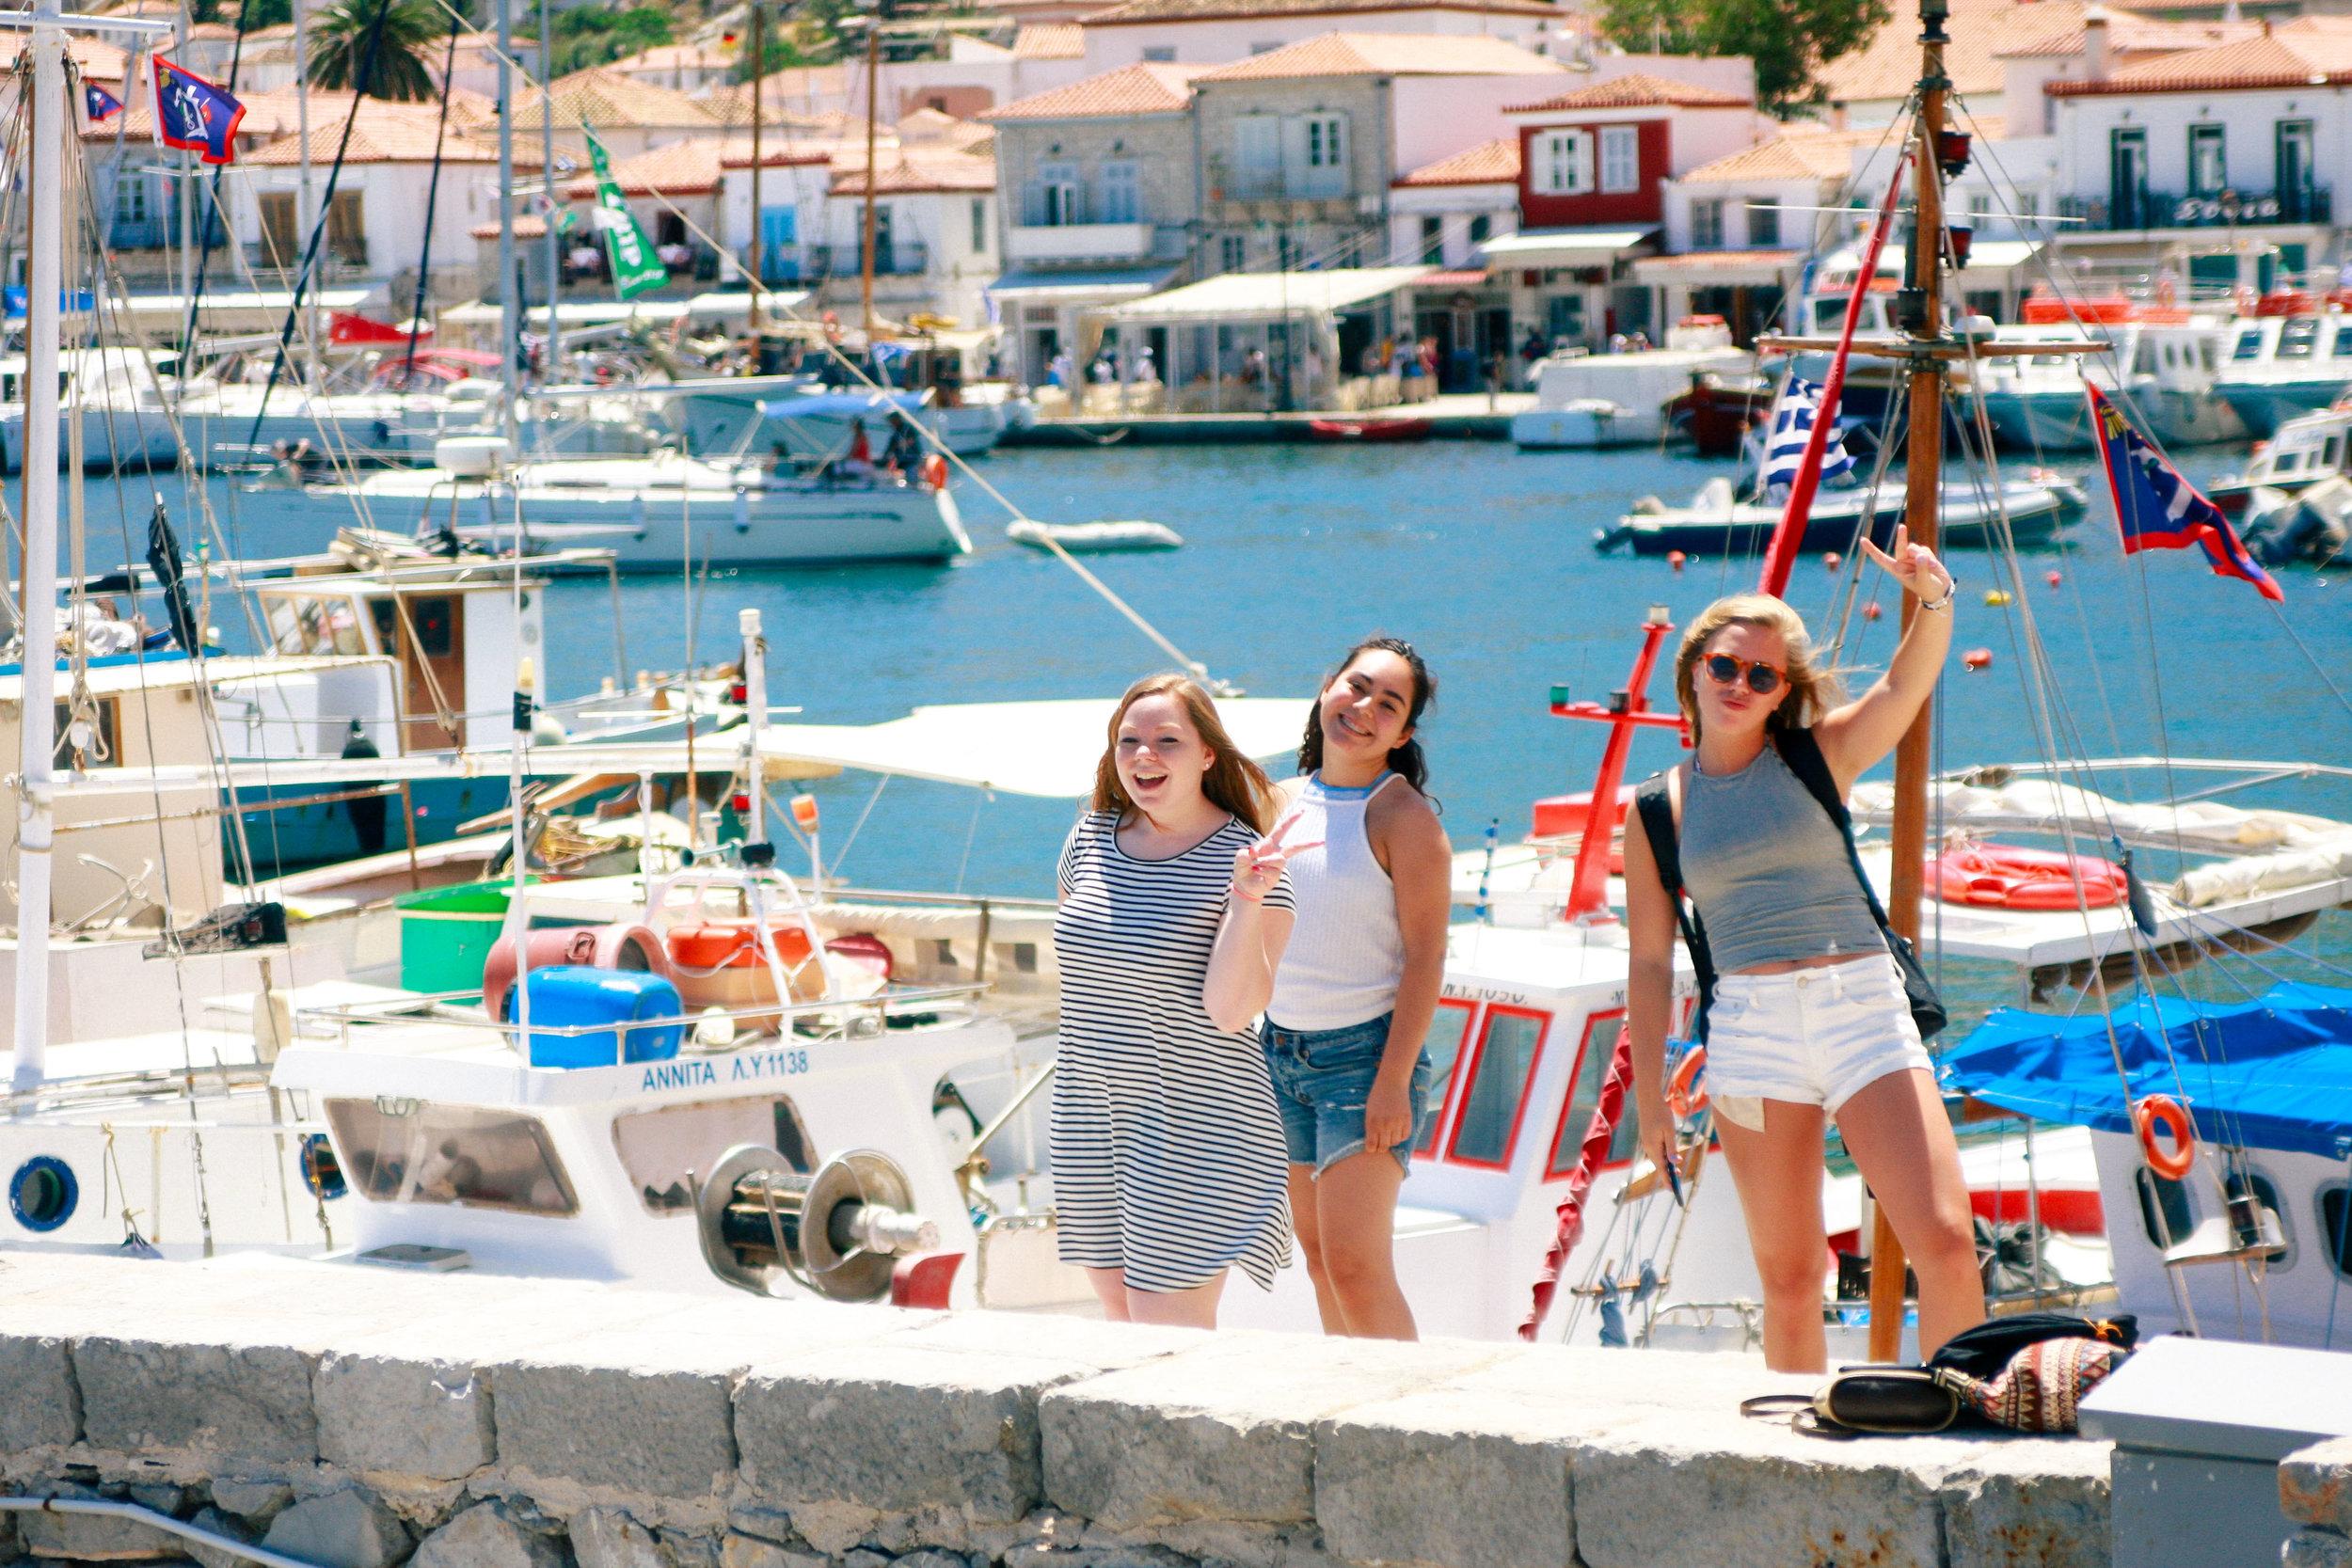 Athens, Greece - Taken during a weekly excursion